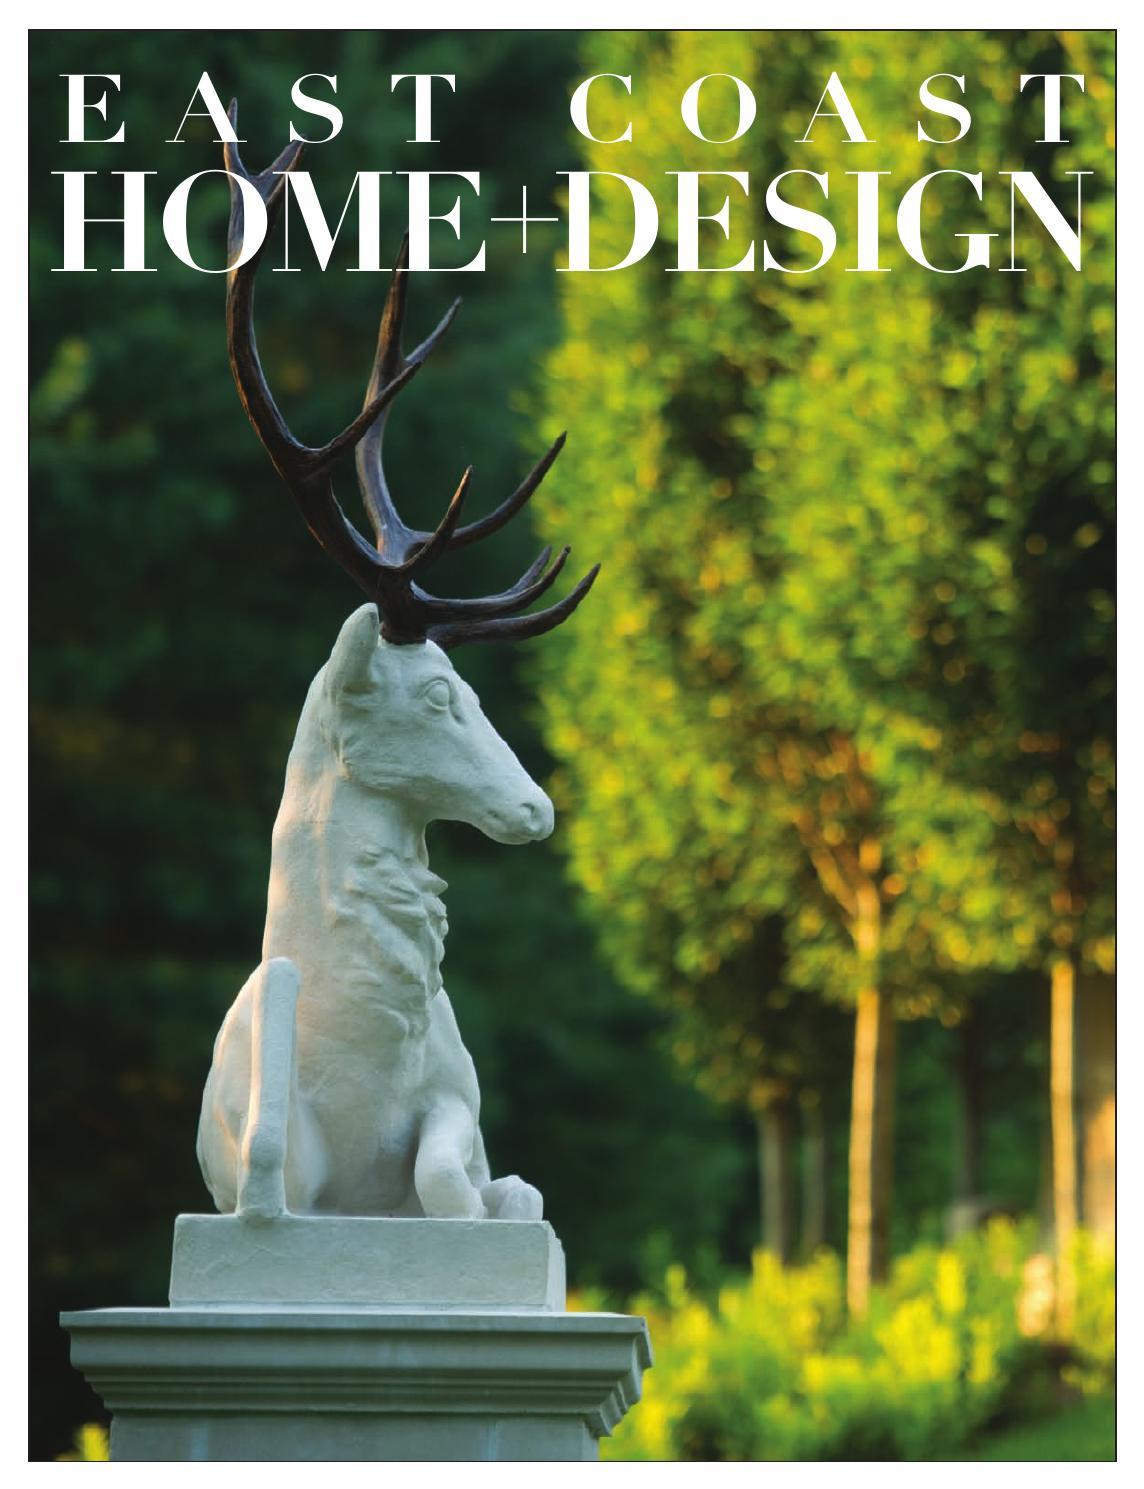 east coast home design may 2014 by east coast home publishing